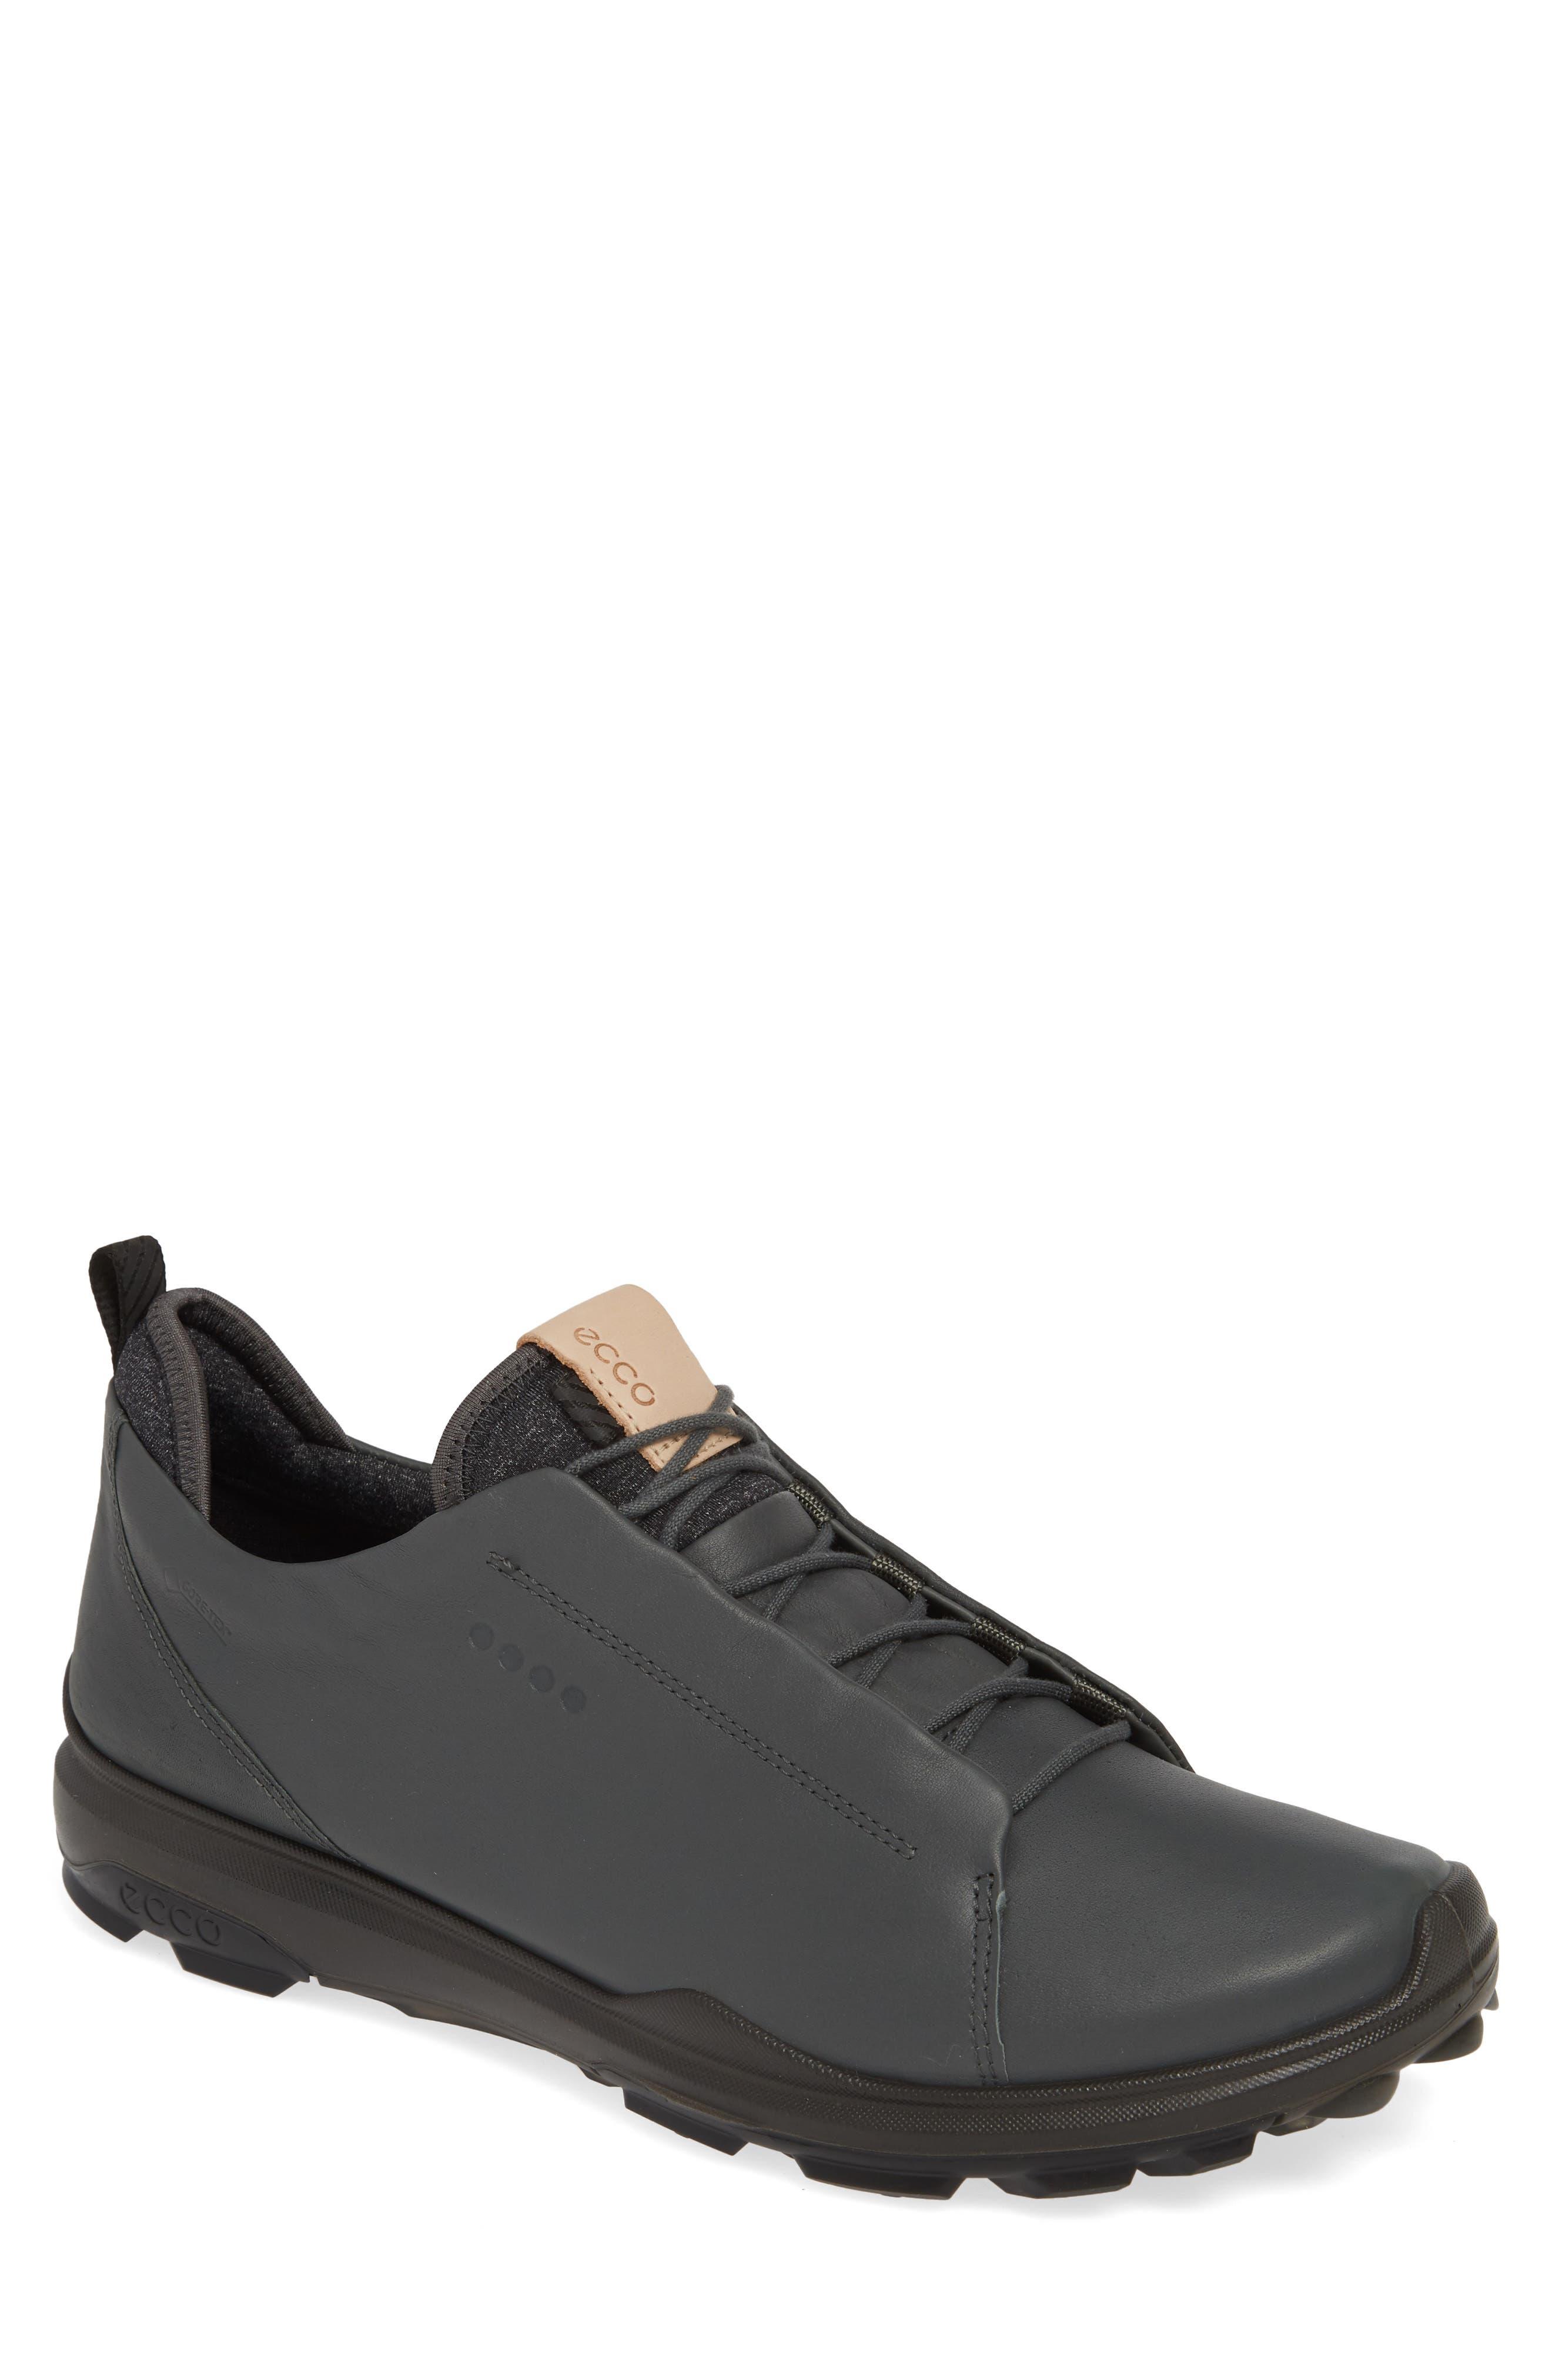 BIOM<sup>®</sup> Hybrid 3 OL Gore-Tex<sup>®</sup> Golf Shoe, Main, color, DARK SHADOW LEATHER